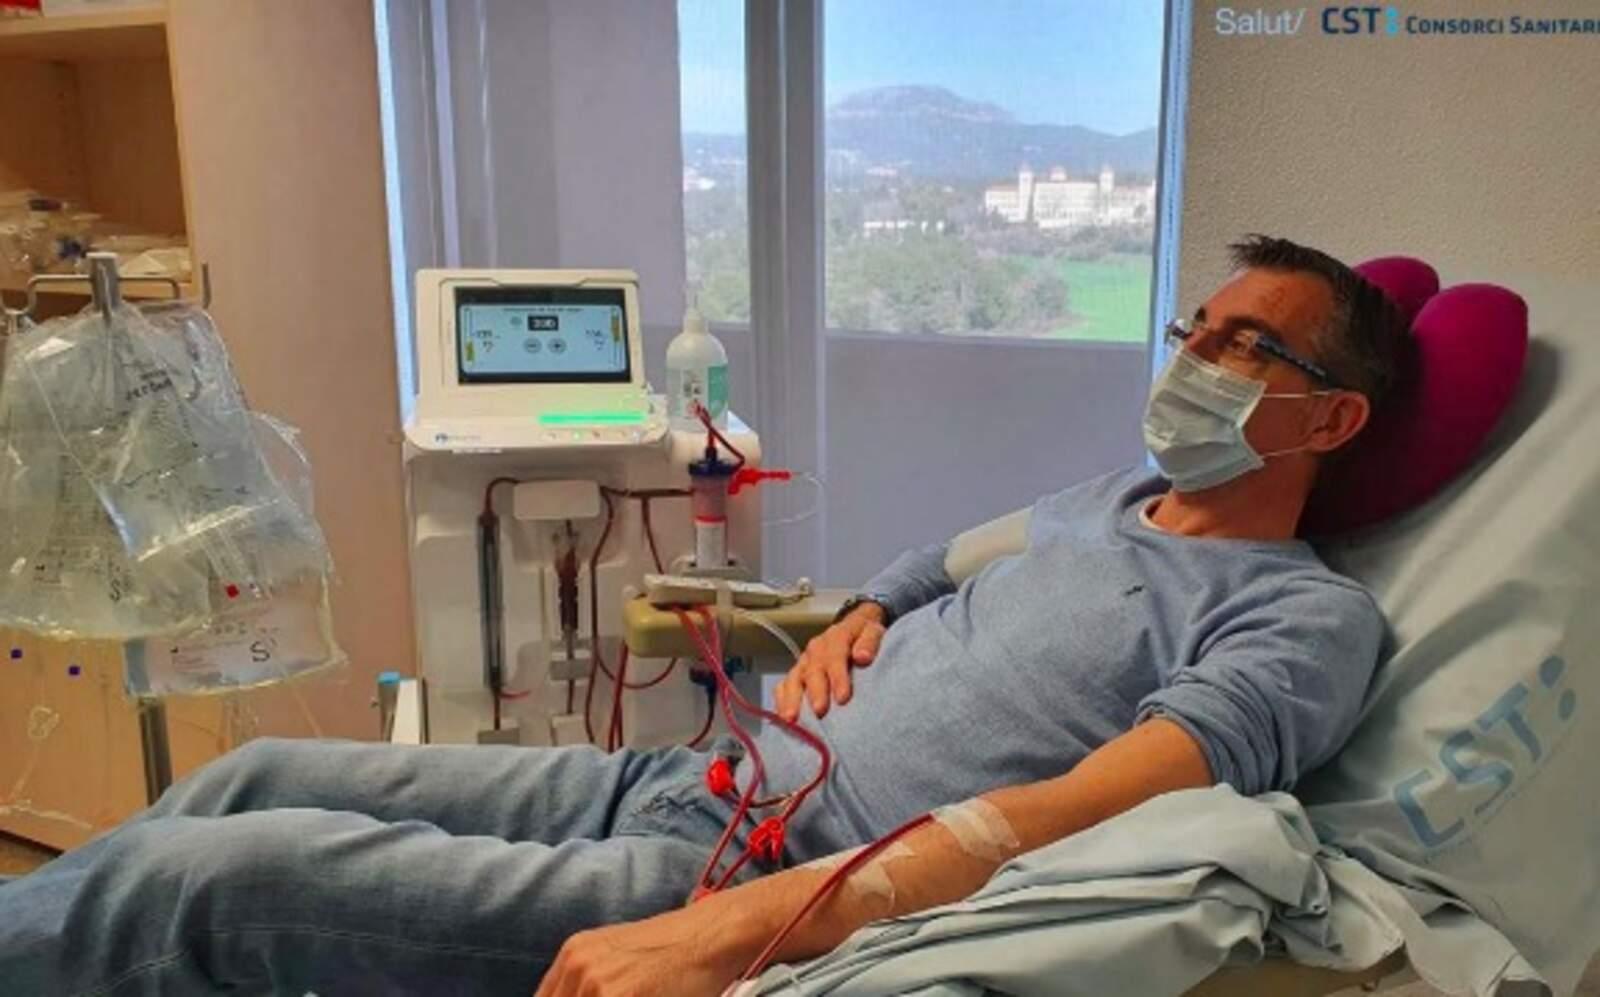 Un pacient fent dialisi